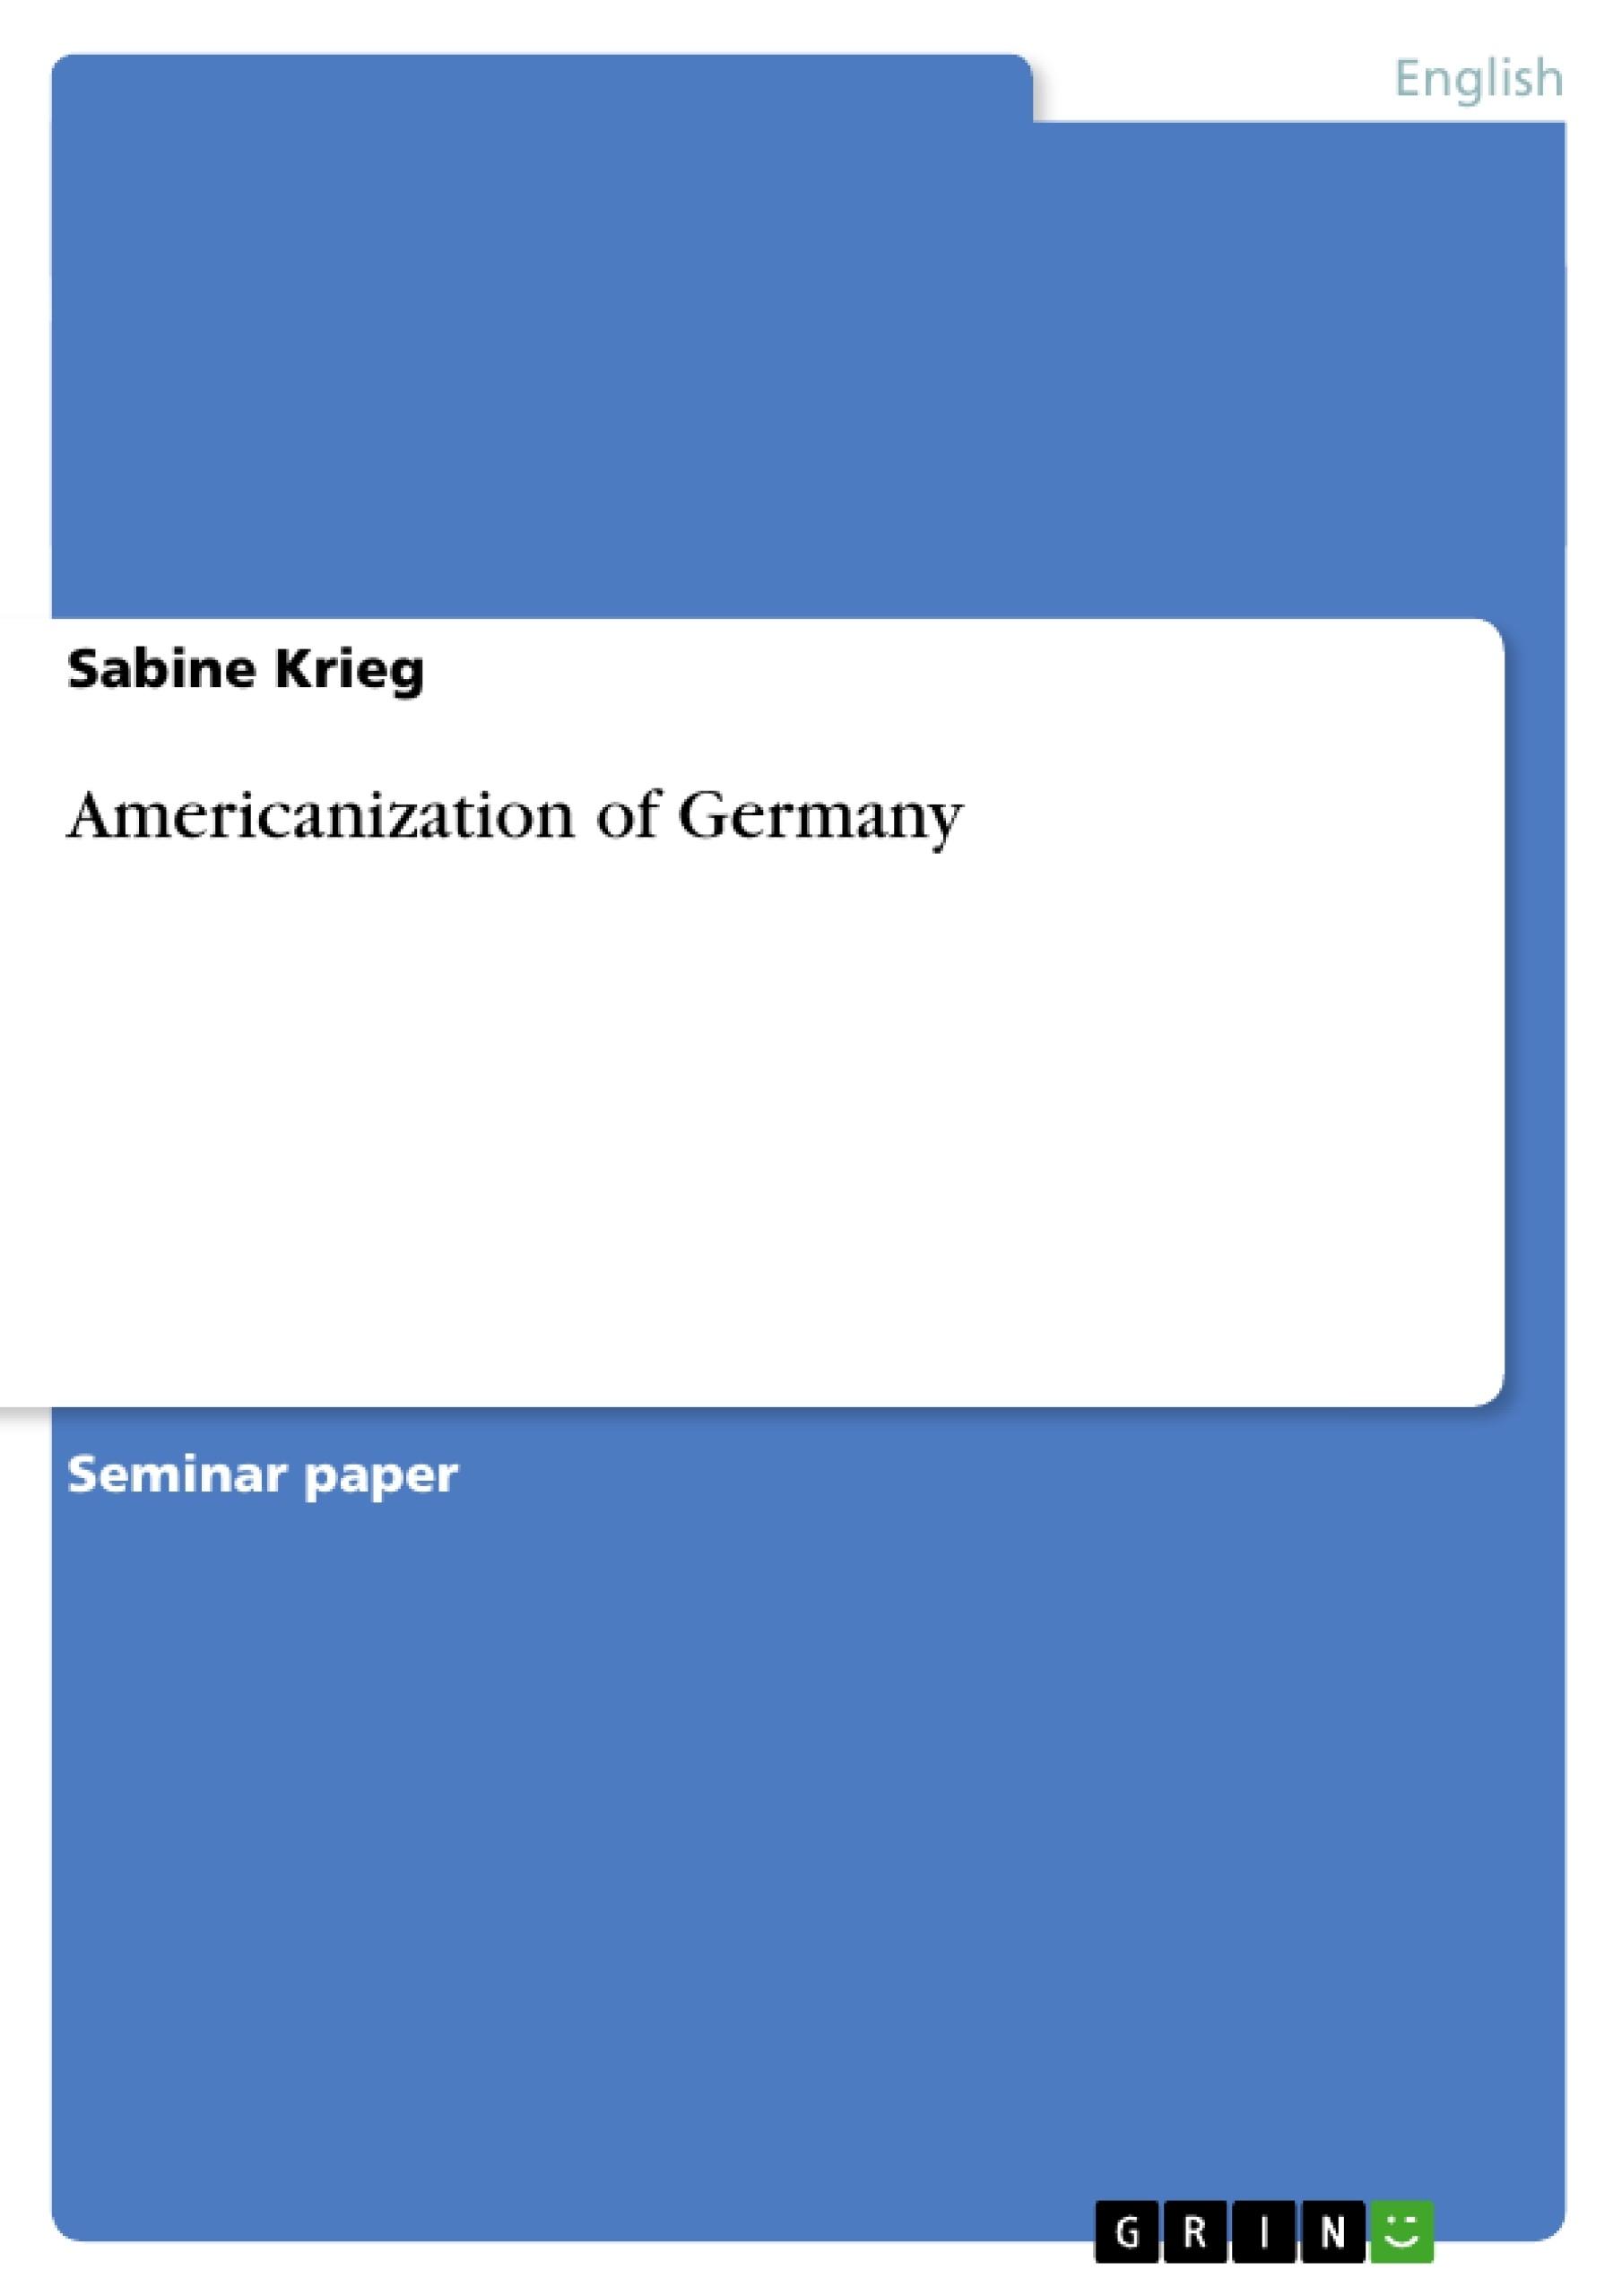 Title: Americanization of Germany